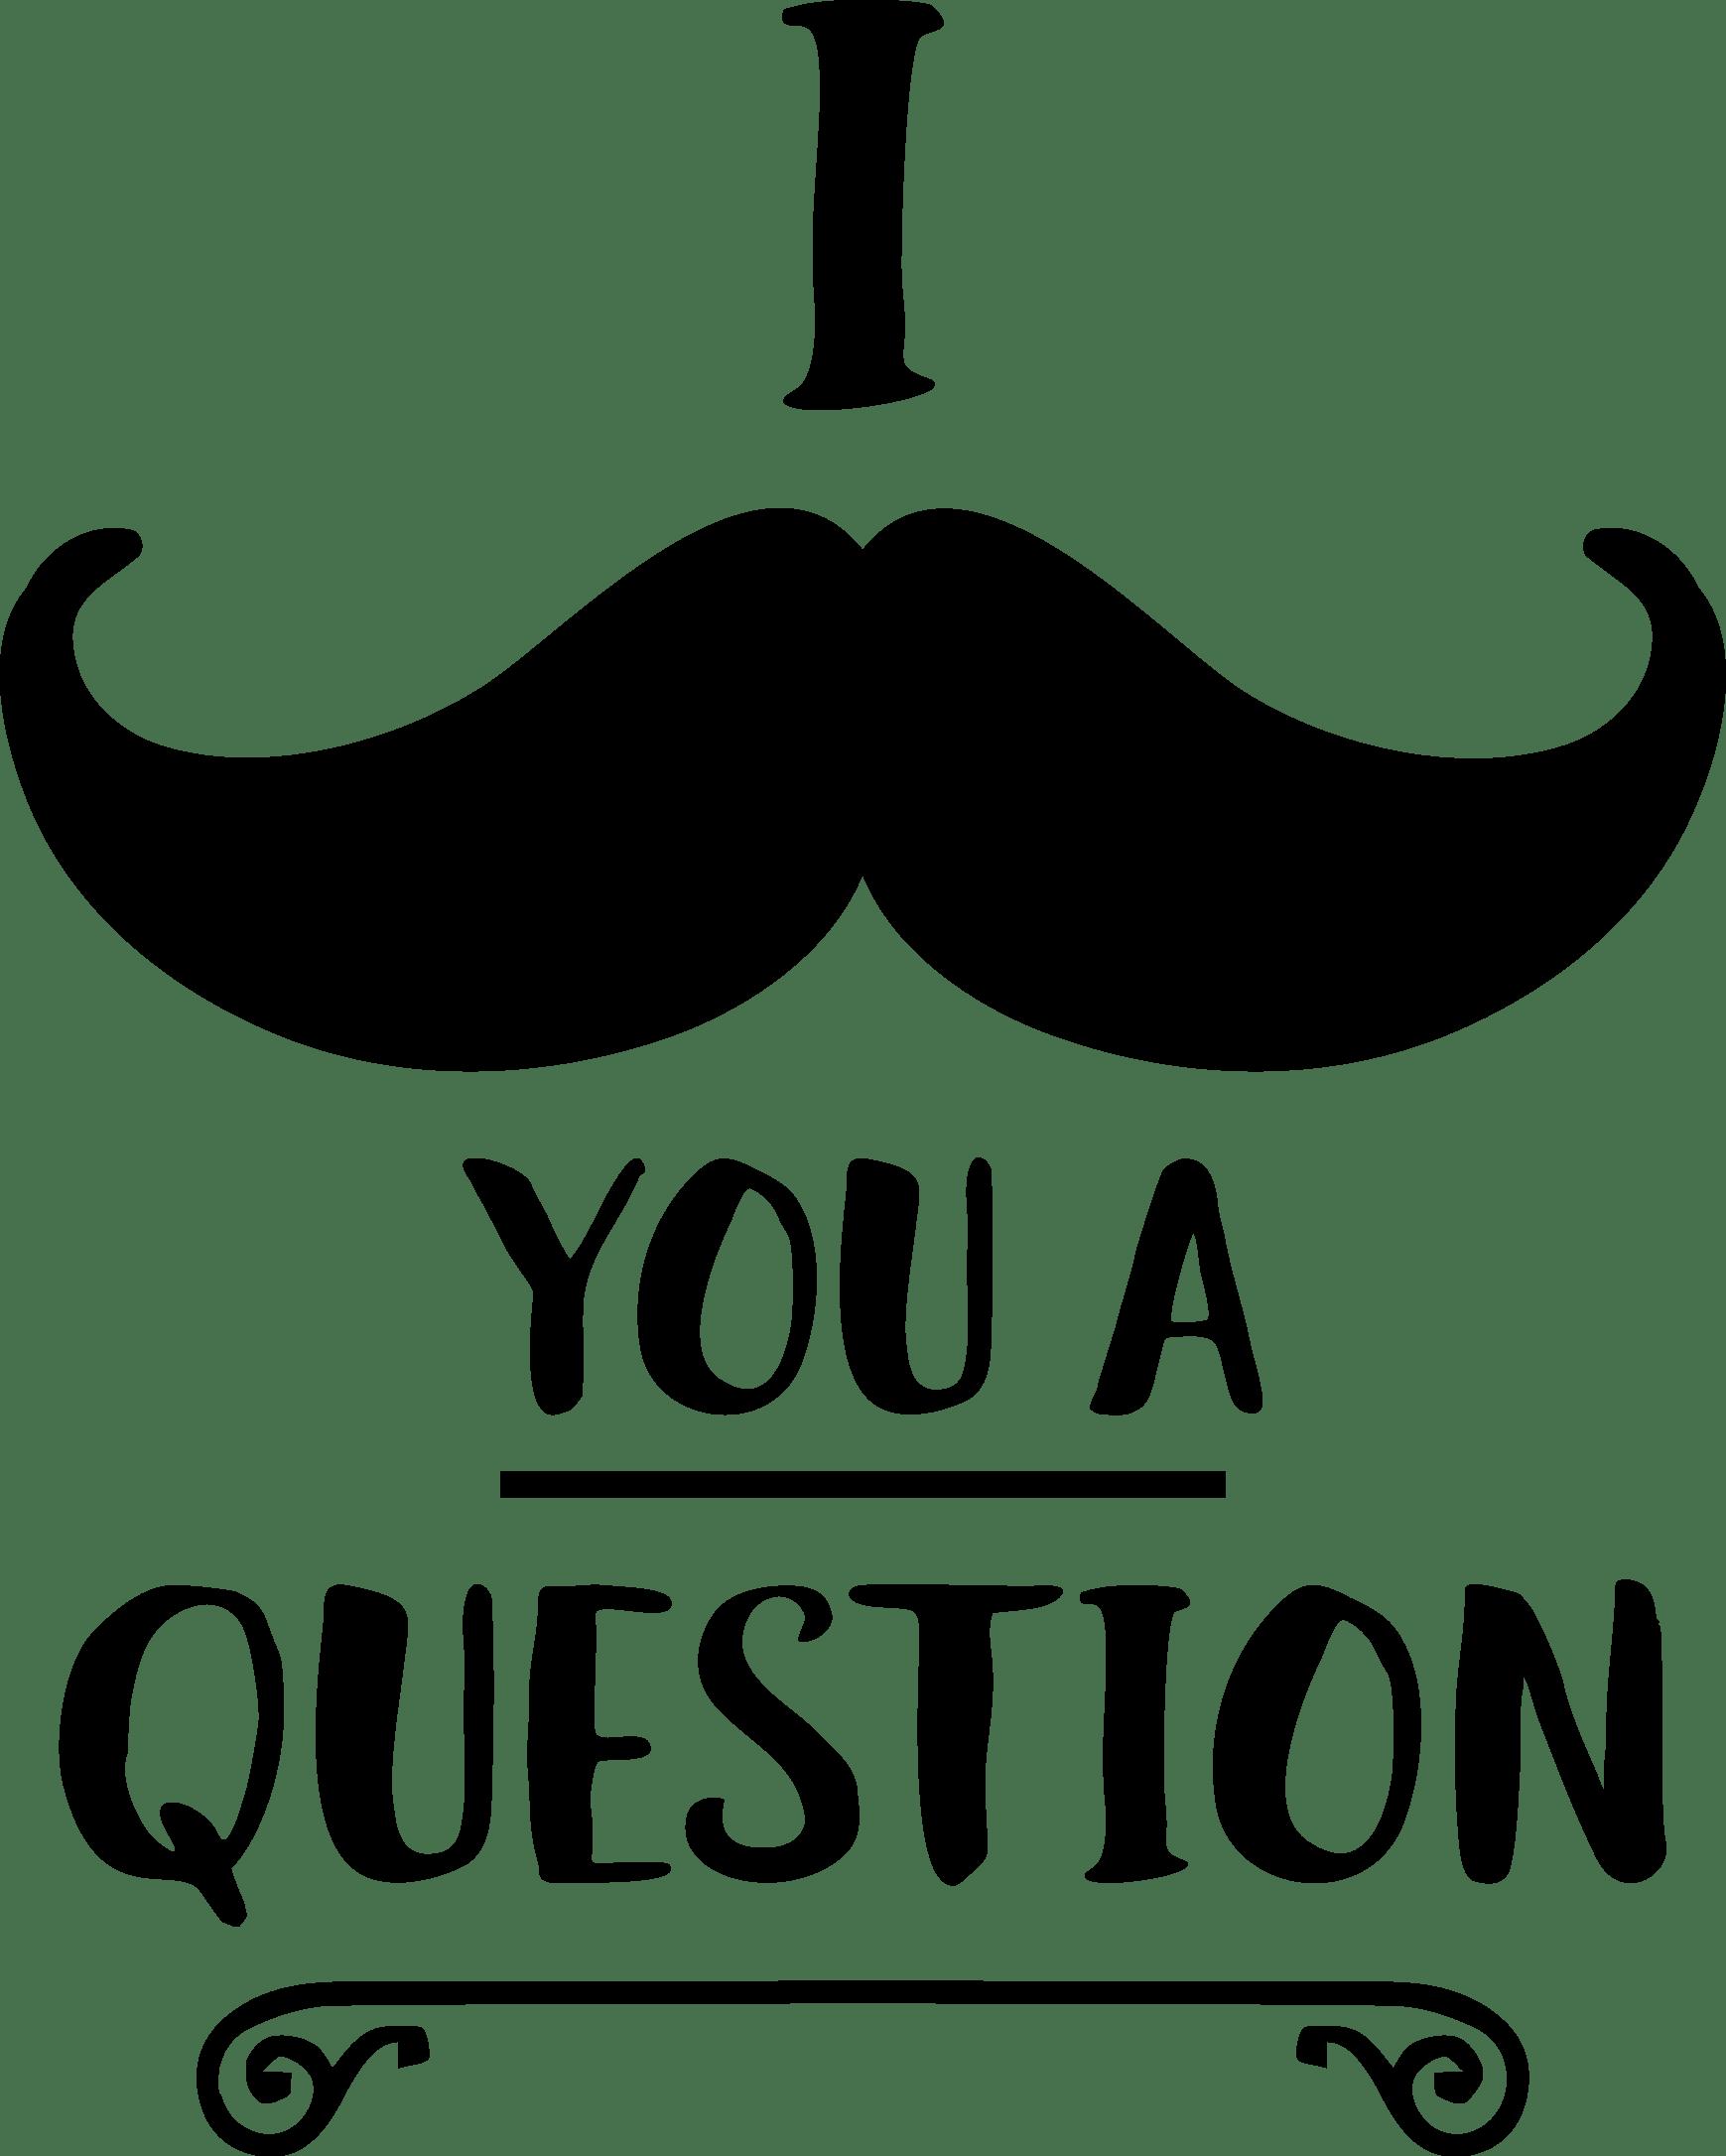 I mustache u a question